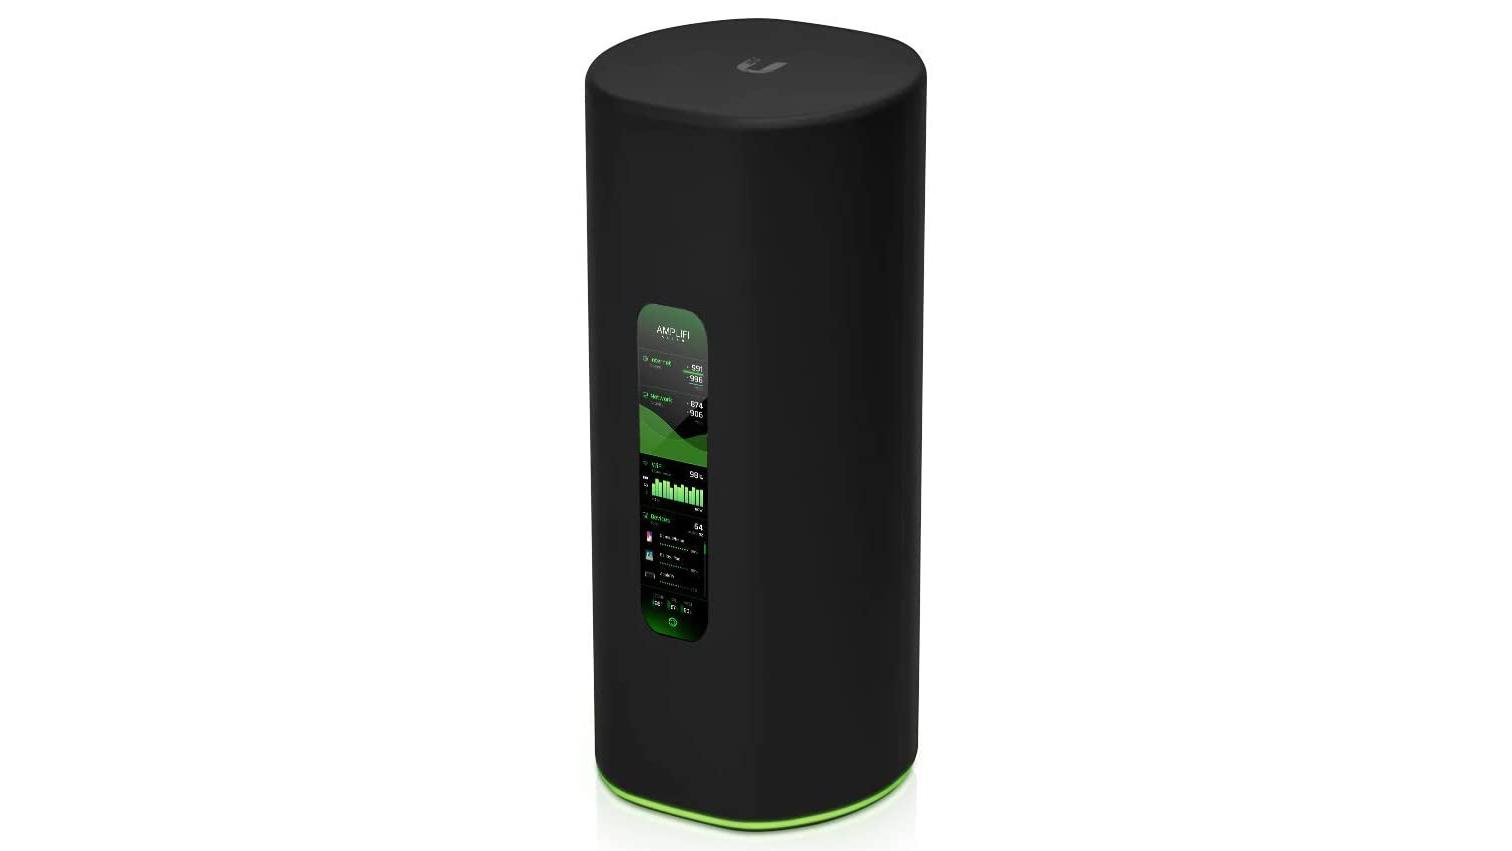 Amplifi Alien router